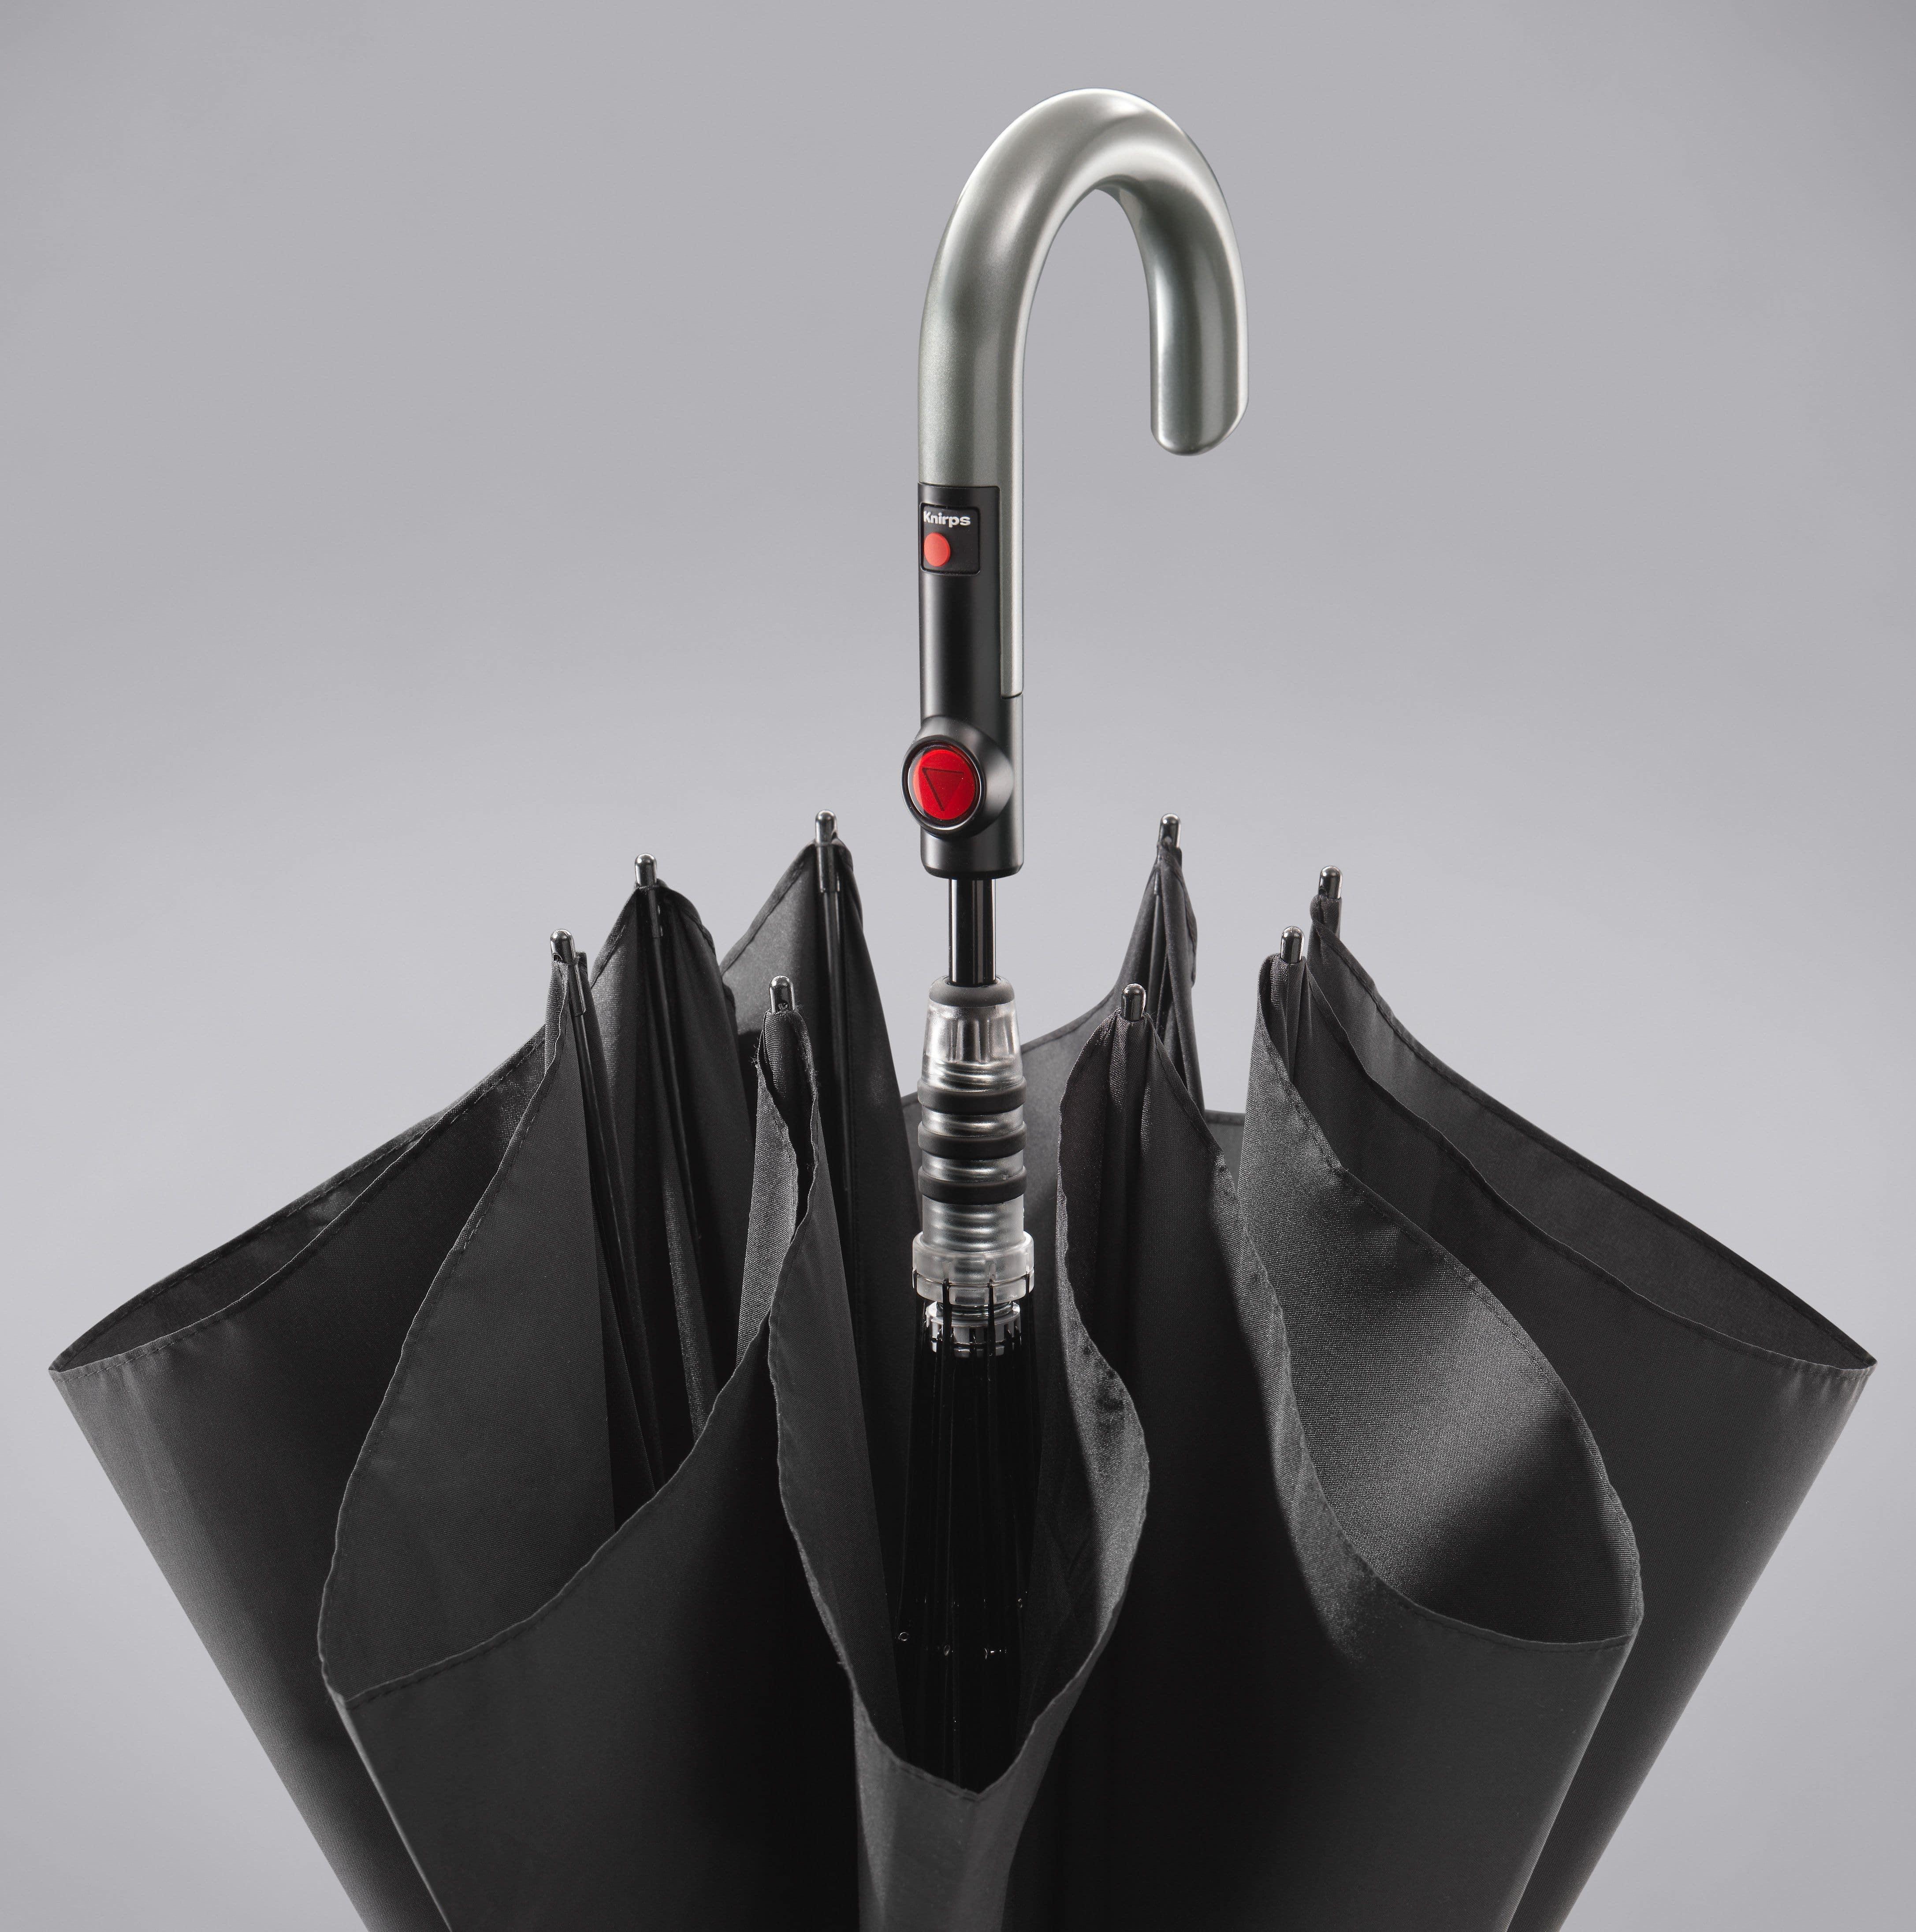 Knirps Umbrella T.703 stick automatic - photo 5